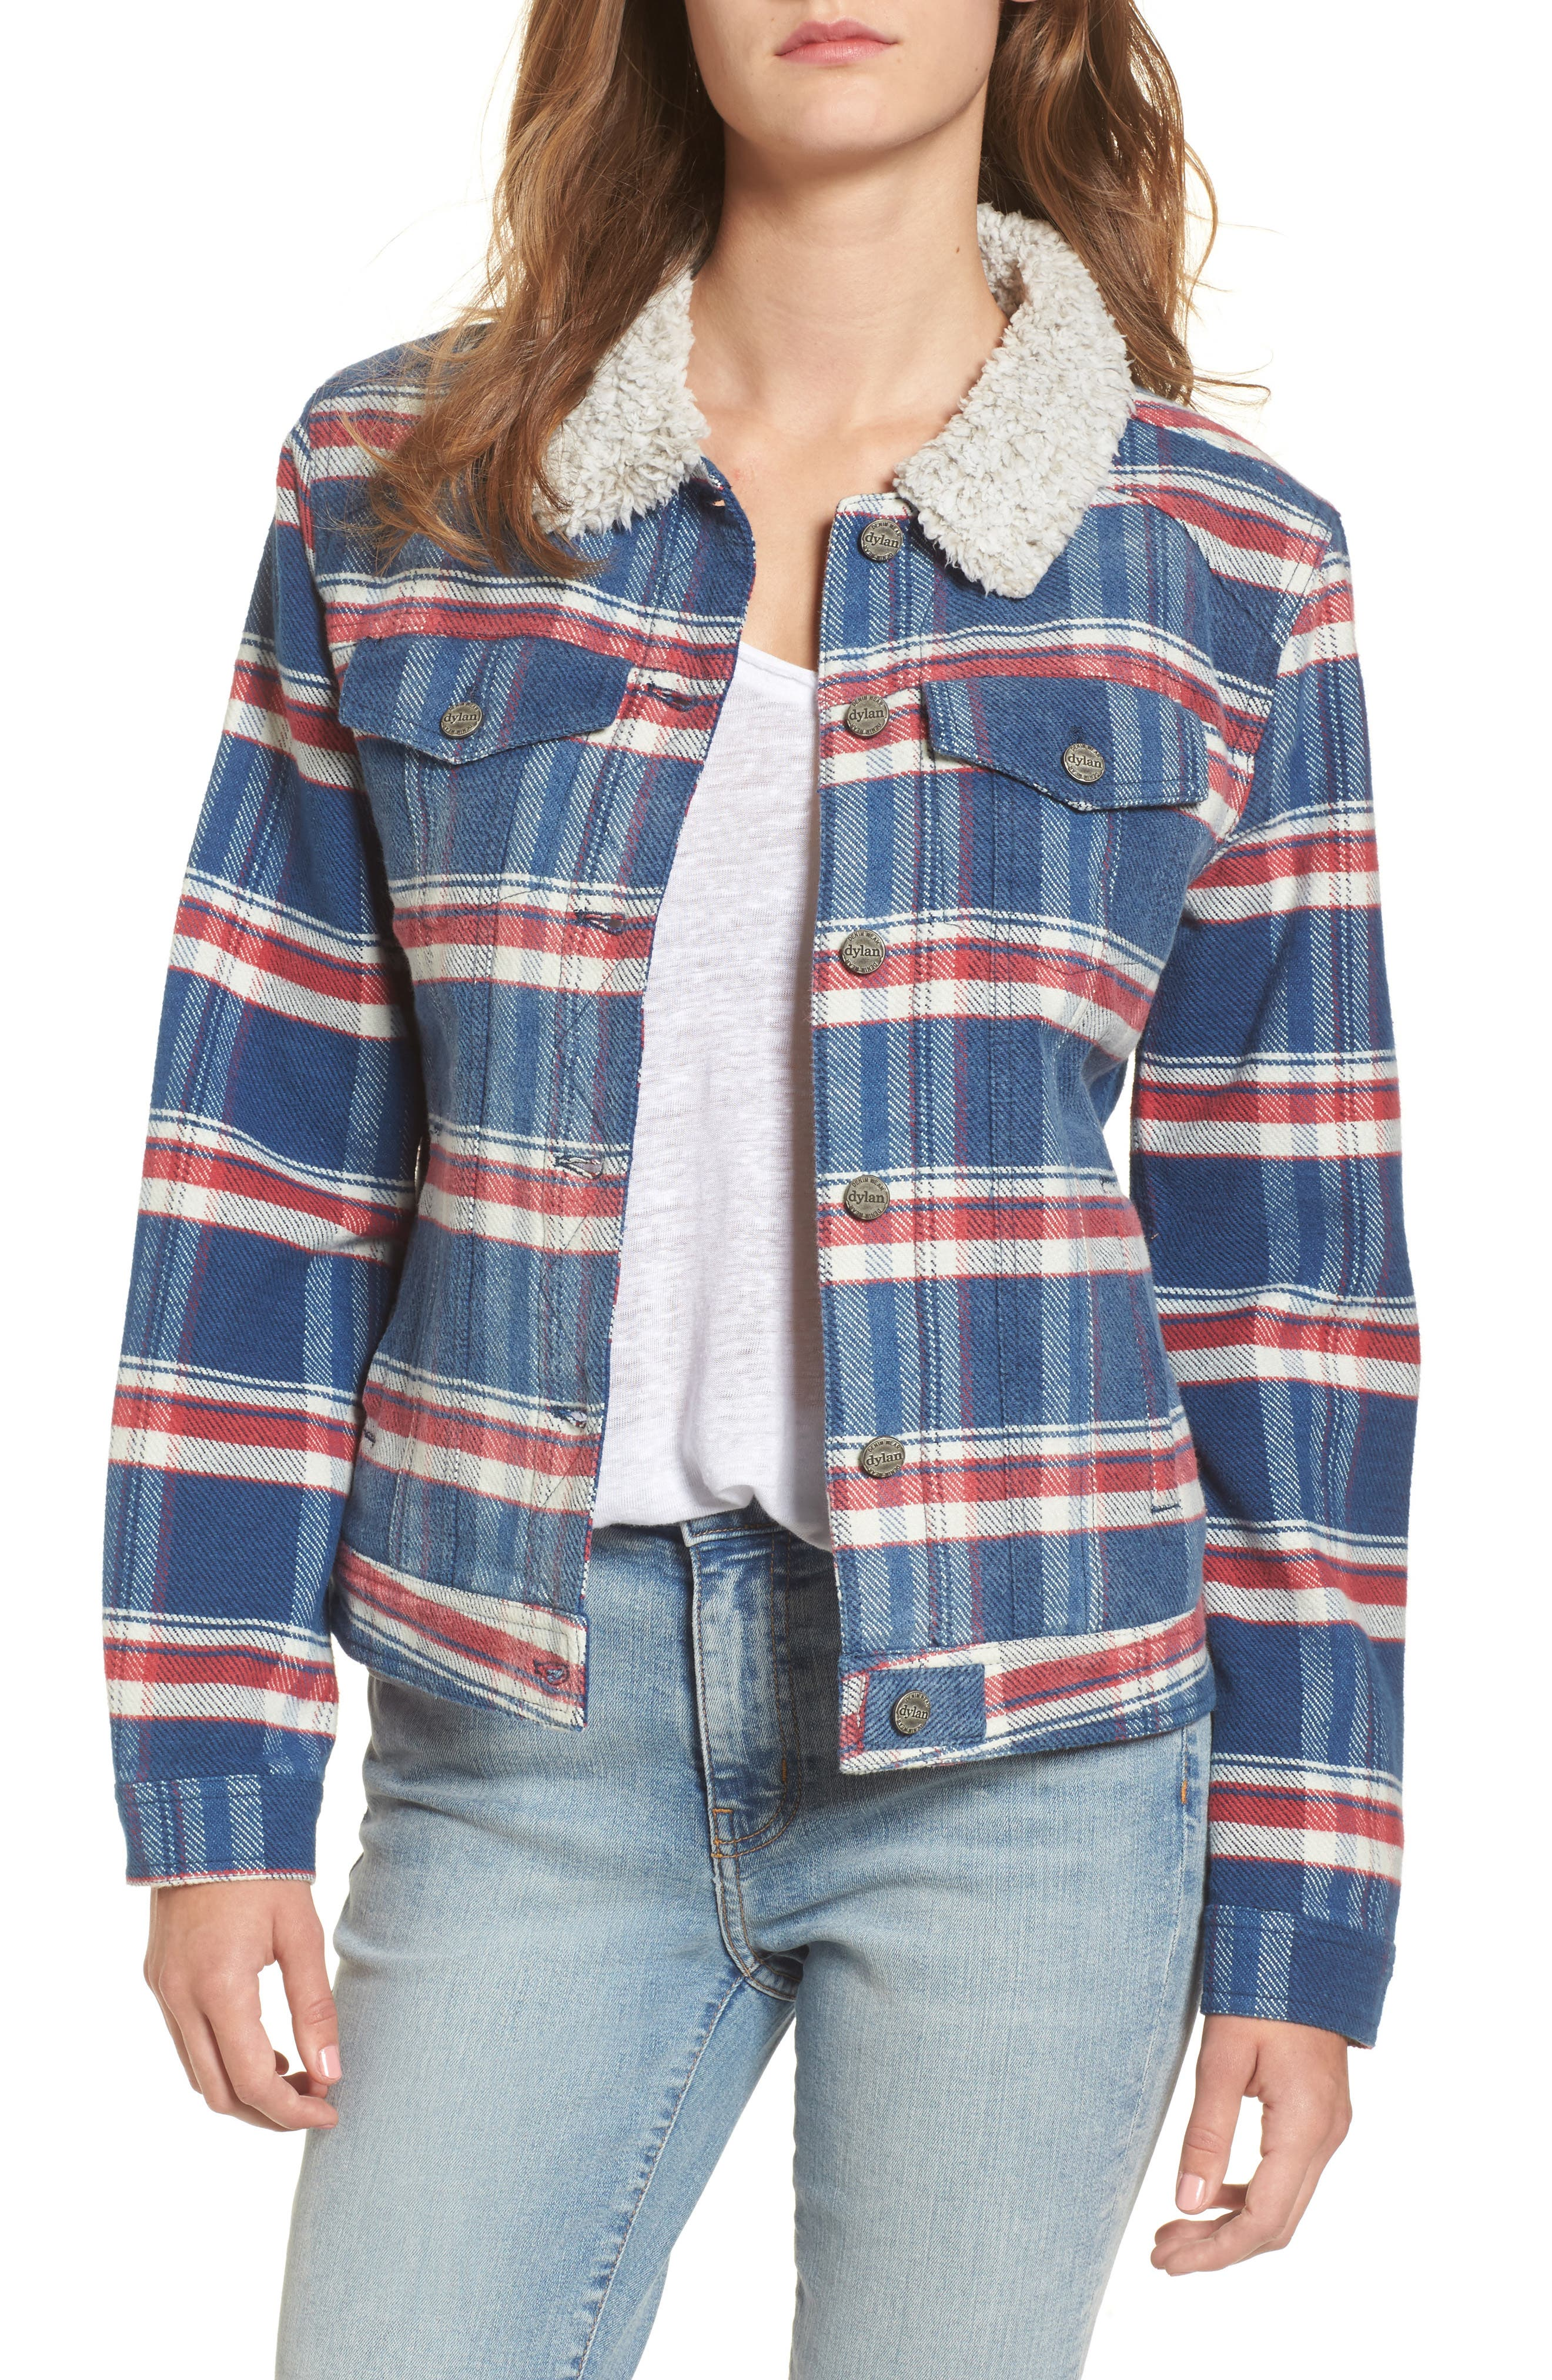 Ella Plaid Denim Jacket with Faux Shearling Collar,                             Main thumbnail 1, color,                             479